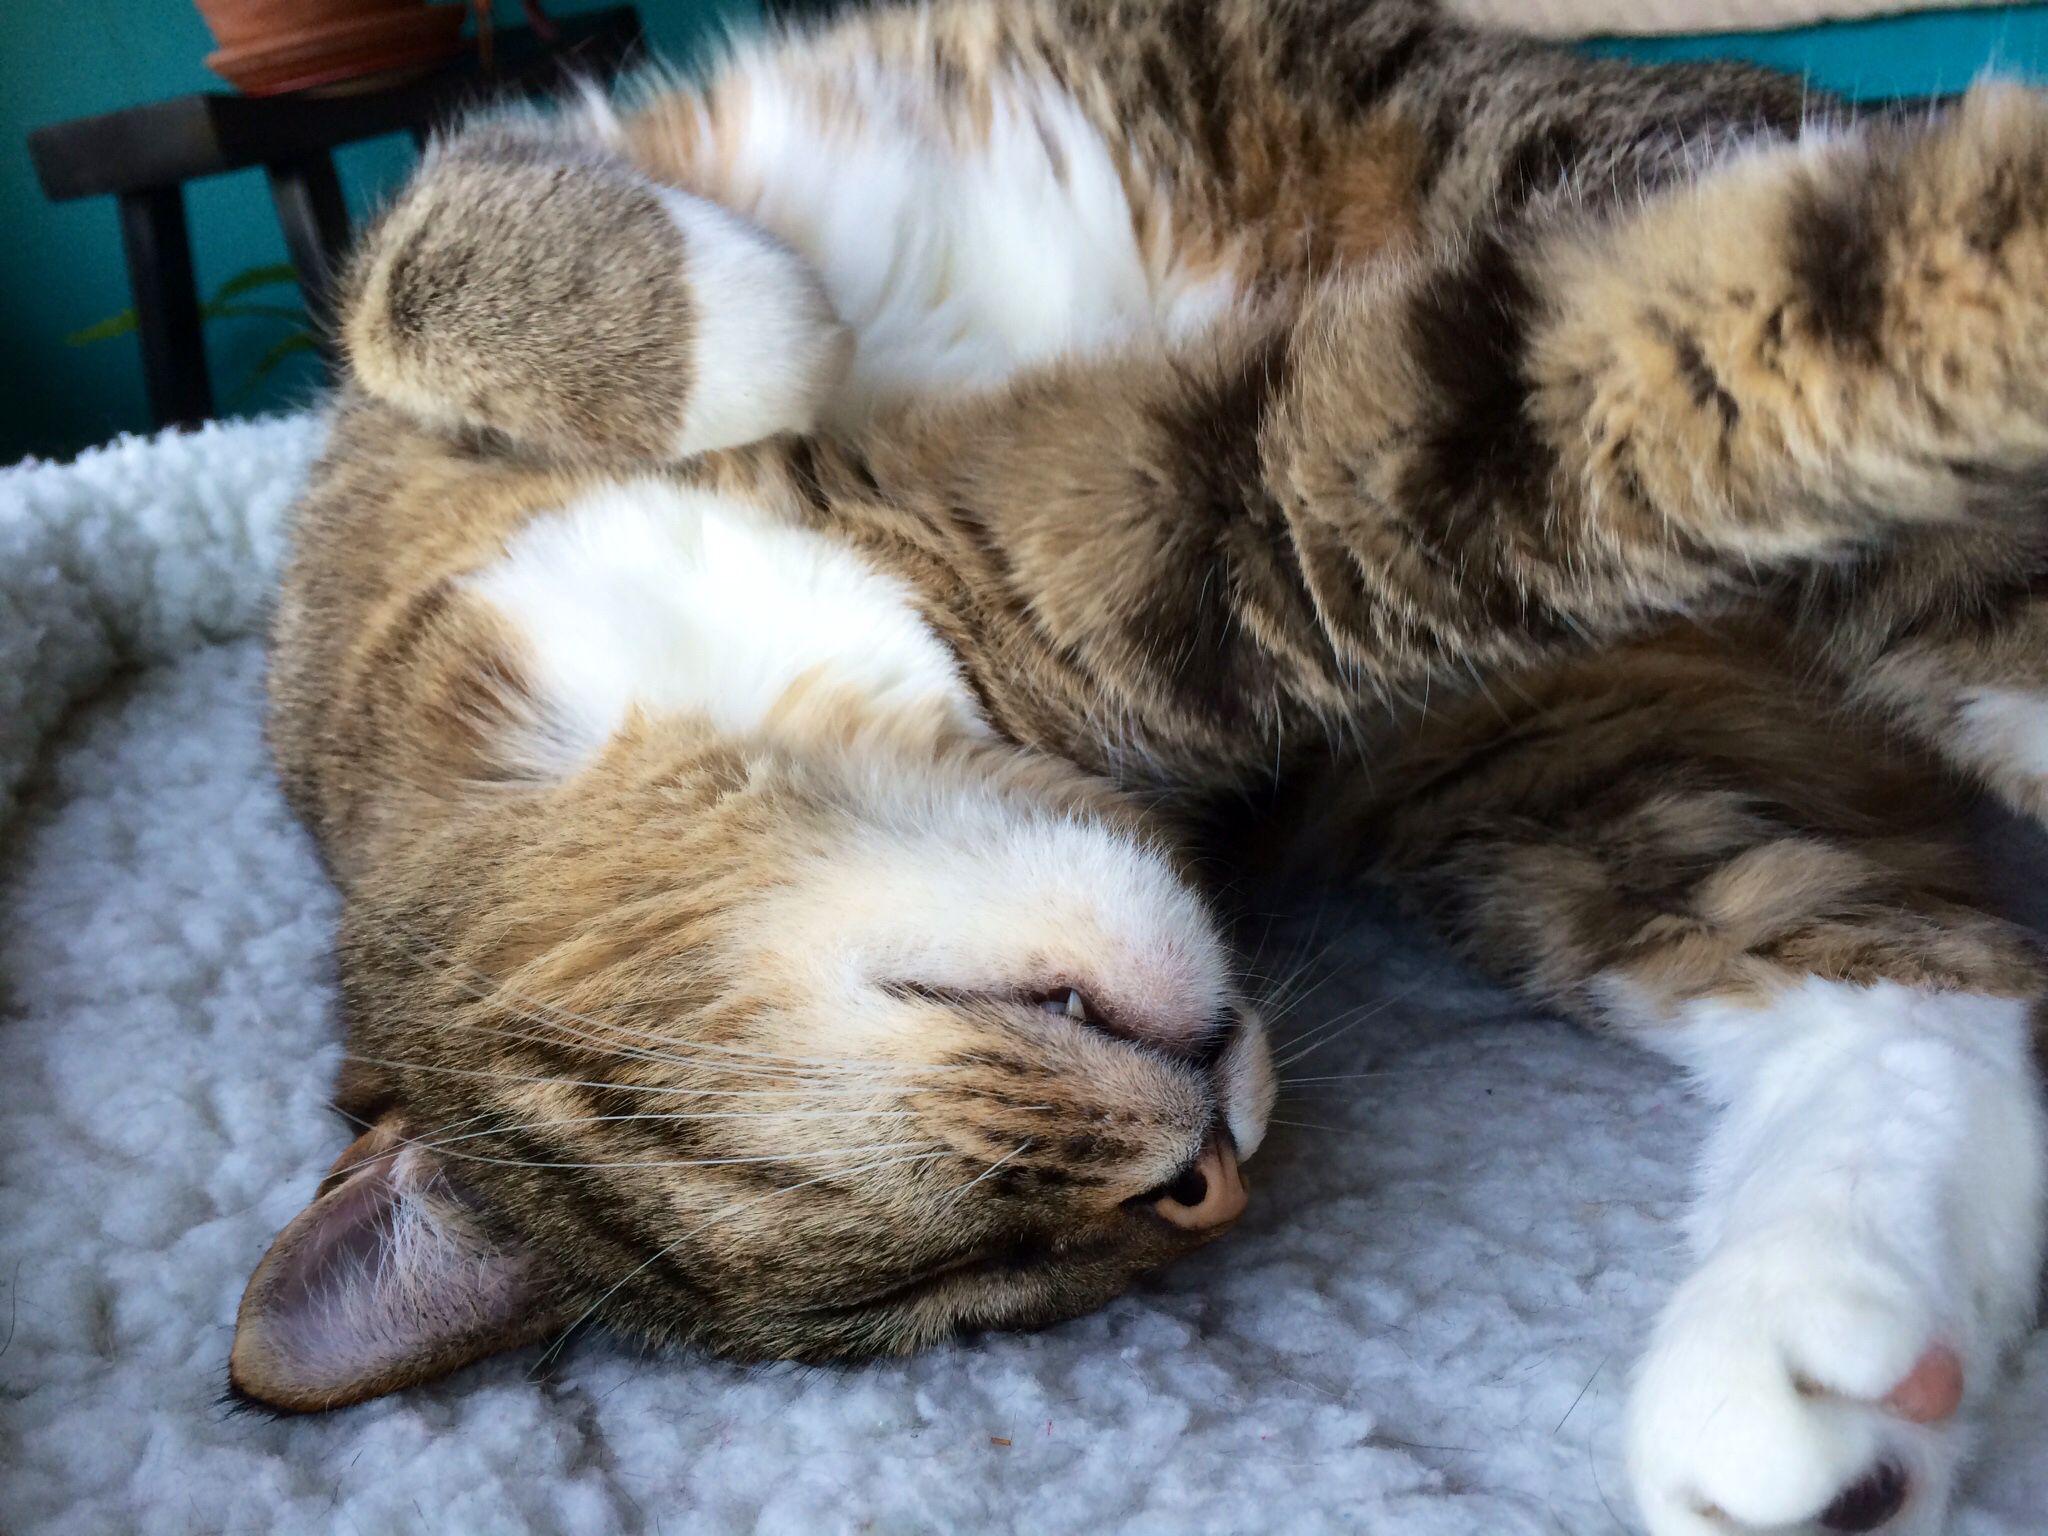 Curled feet cats animals feet